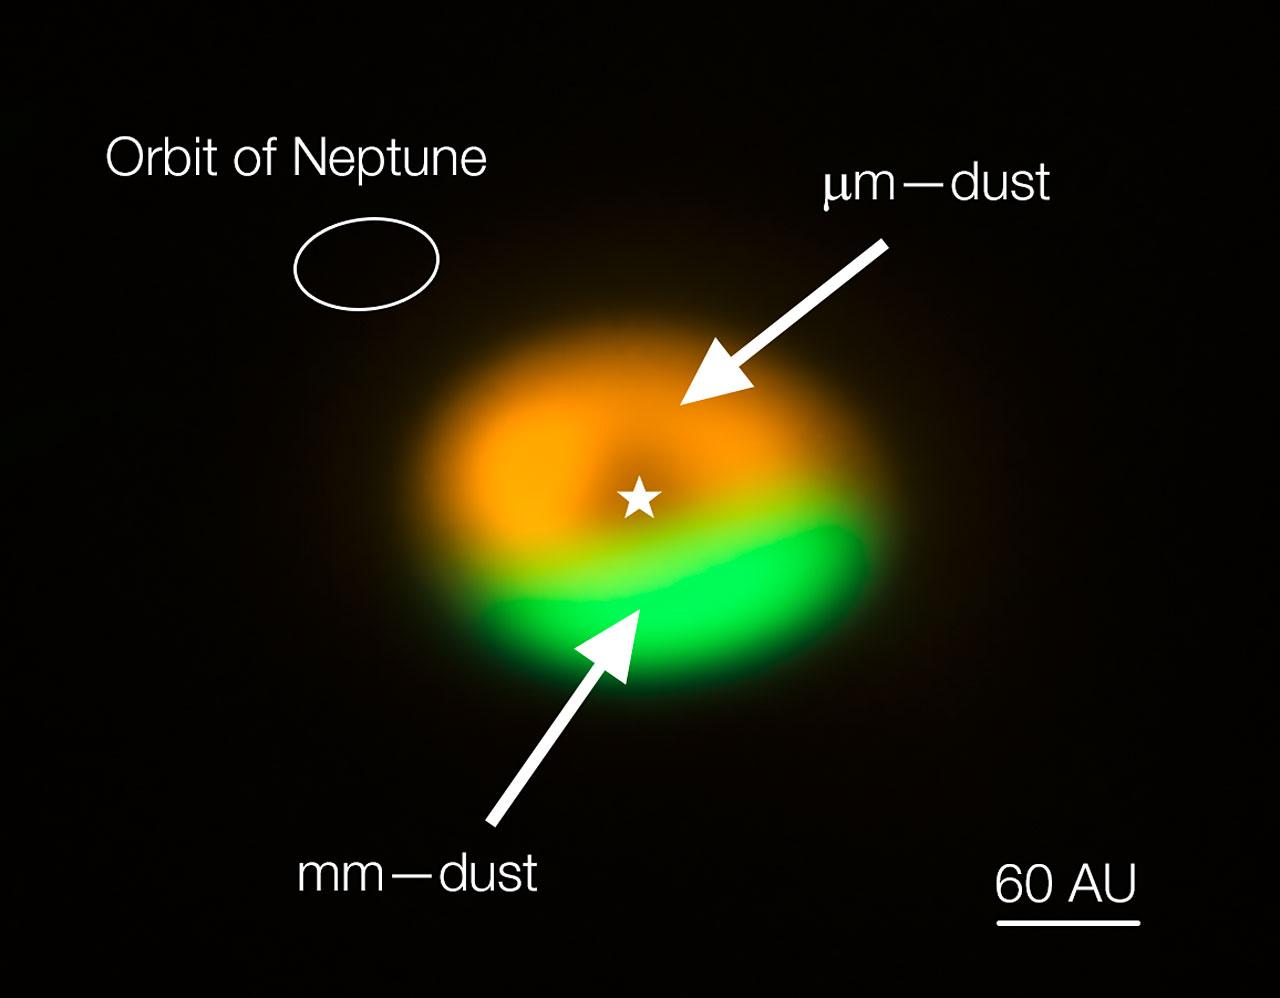 http://www.astro.cz/_data/images/news/2013/06/07/eso1325d.jpg